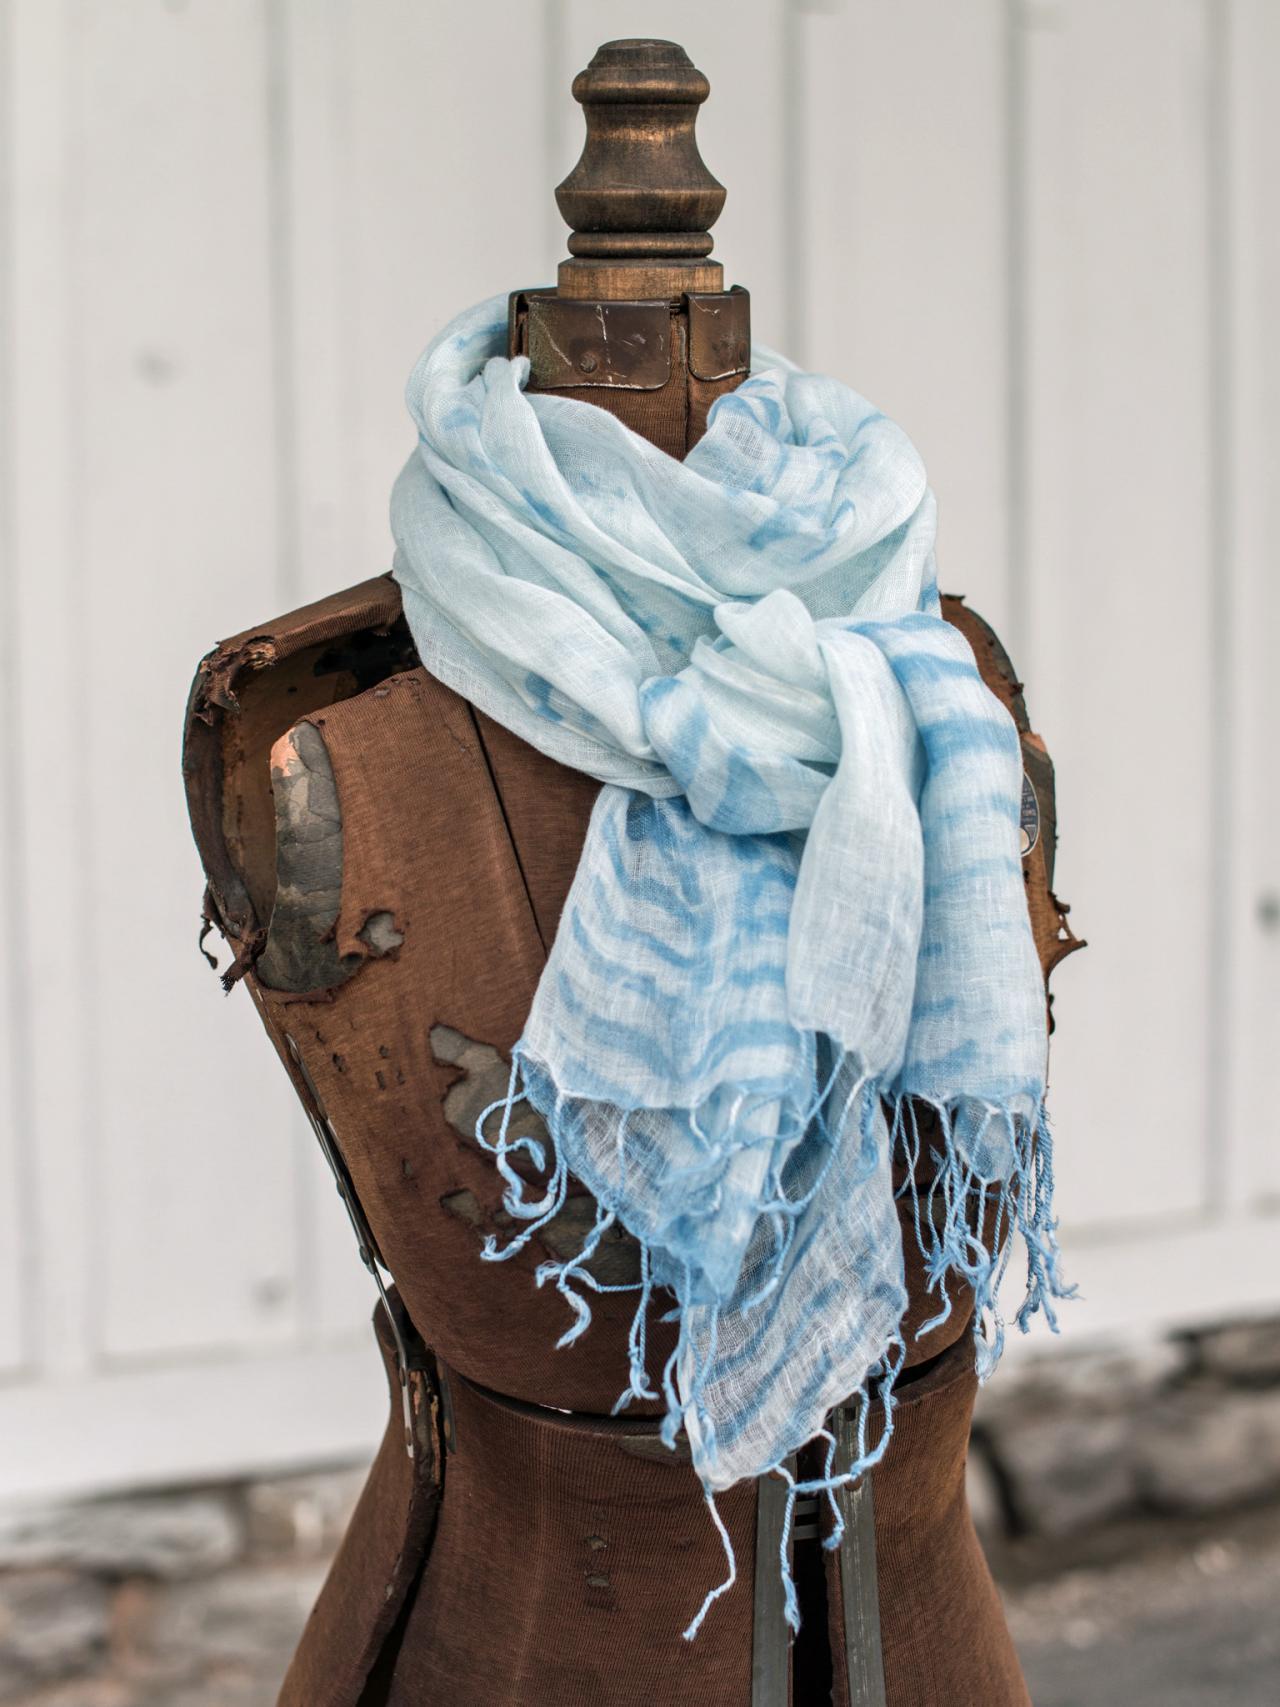 db69aa6c536 Make a Beautiful Shibori-Style Scarf Using Natural Indigo Dye